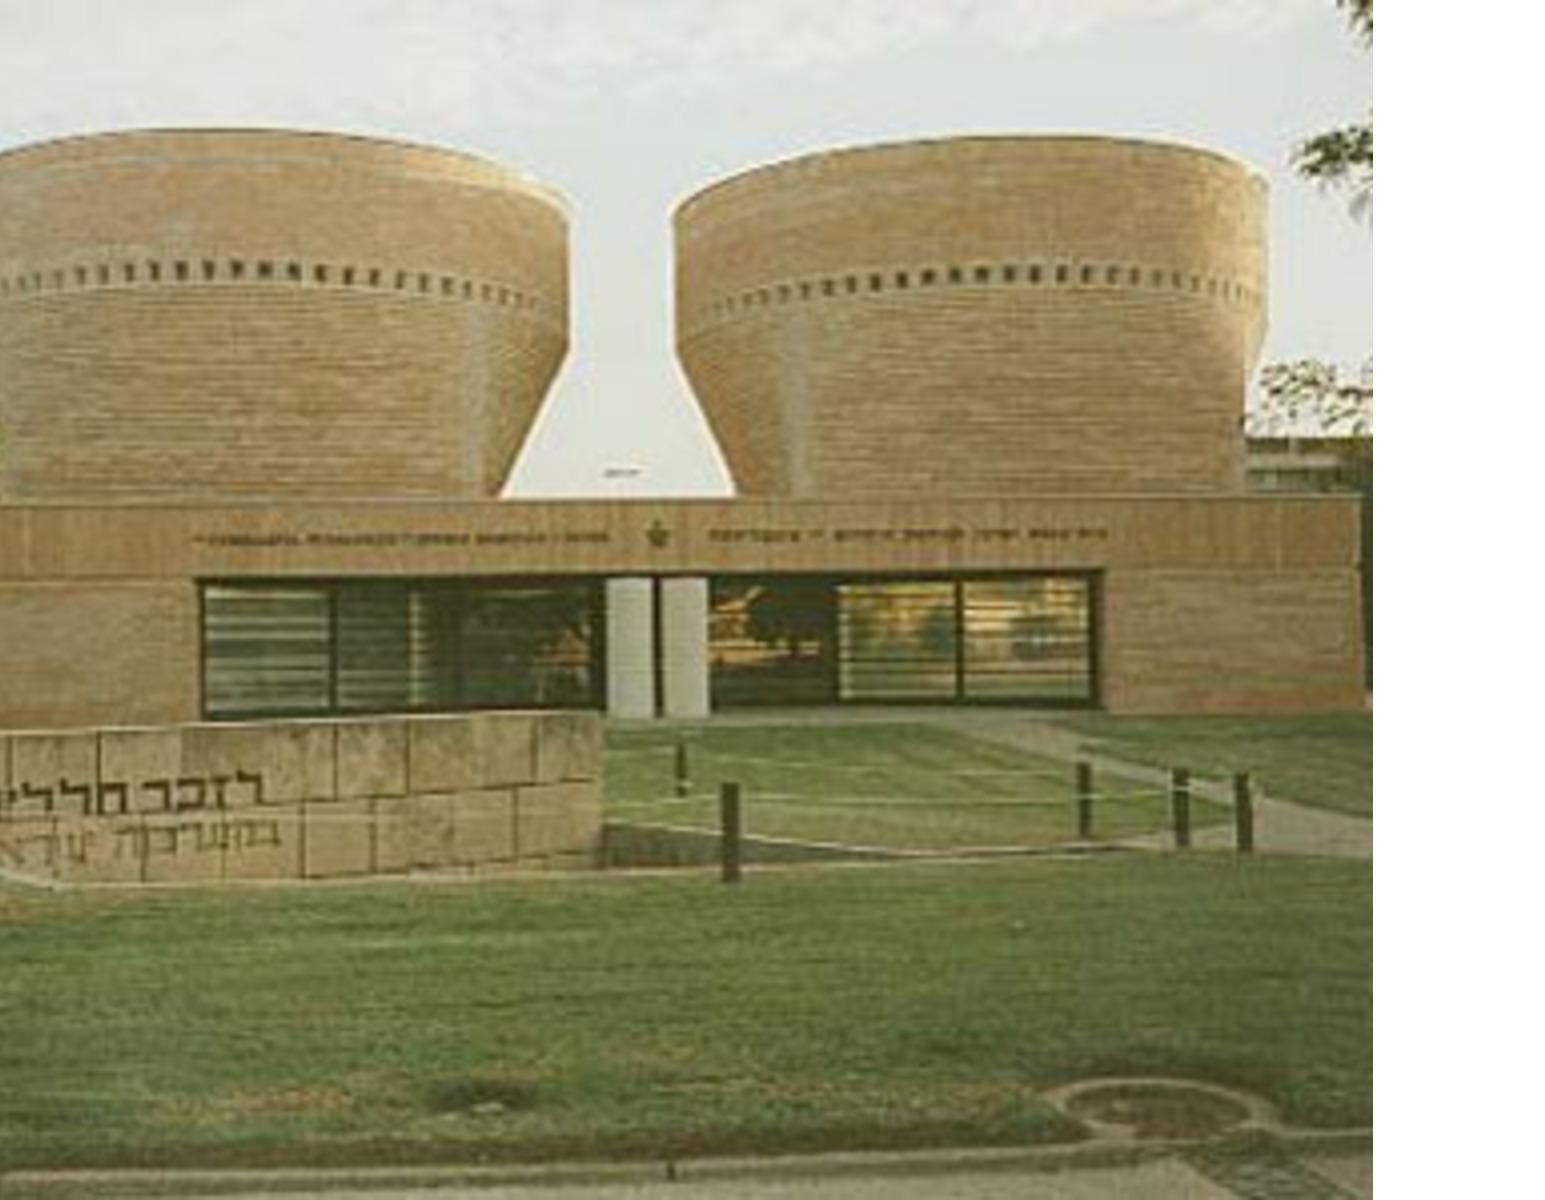 Biography of the architect Mario Botta